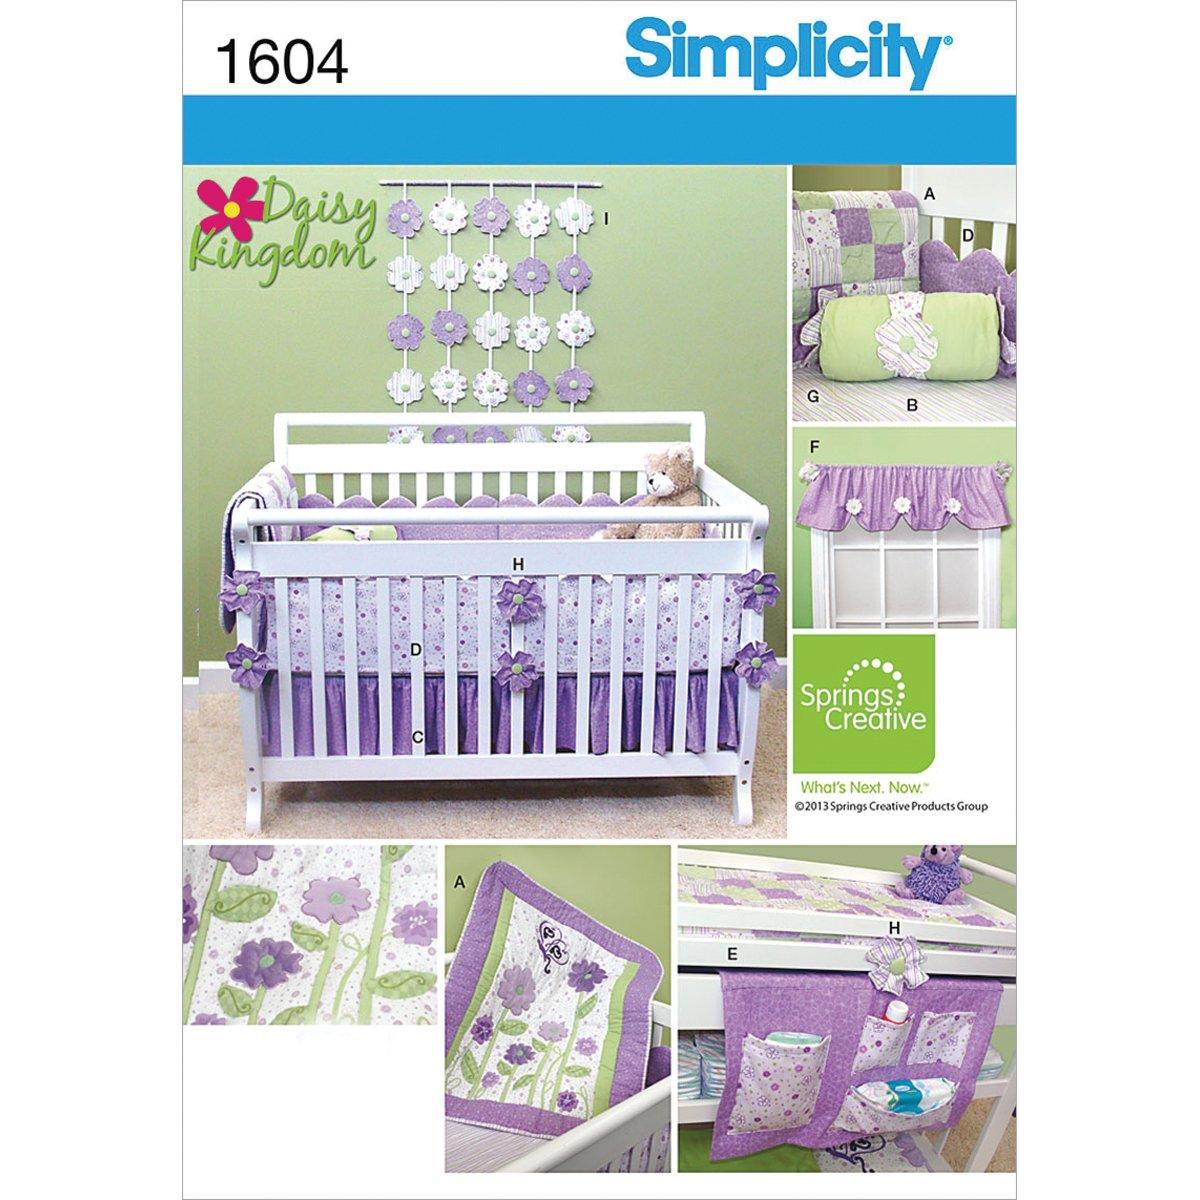 Simplicity Creative Patterns 1604 Daisy Kingdom Nursery Accessories